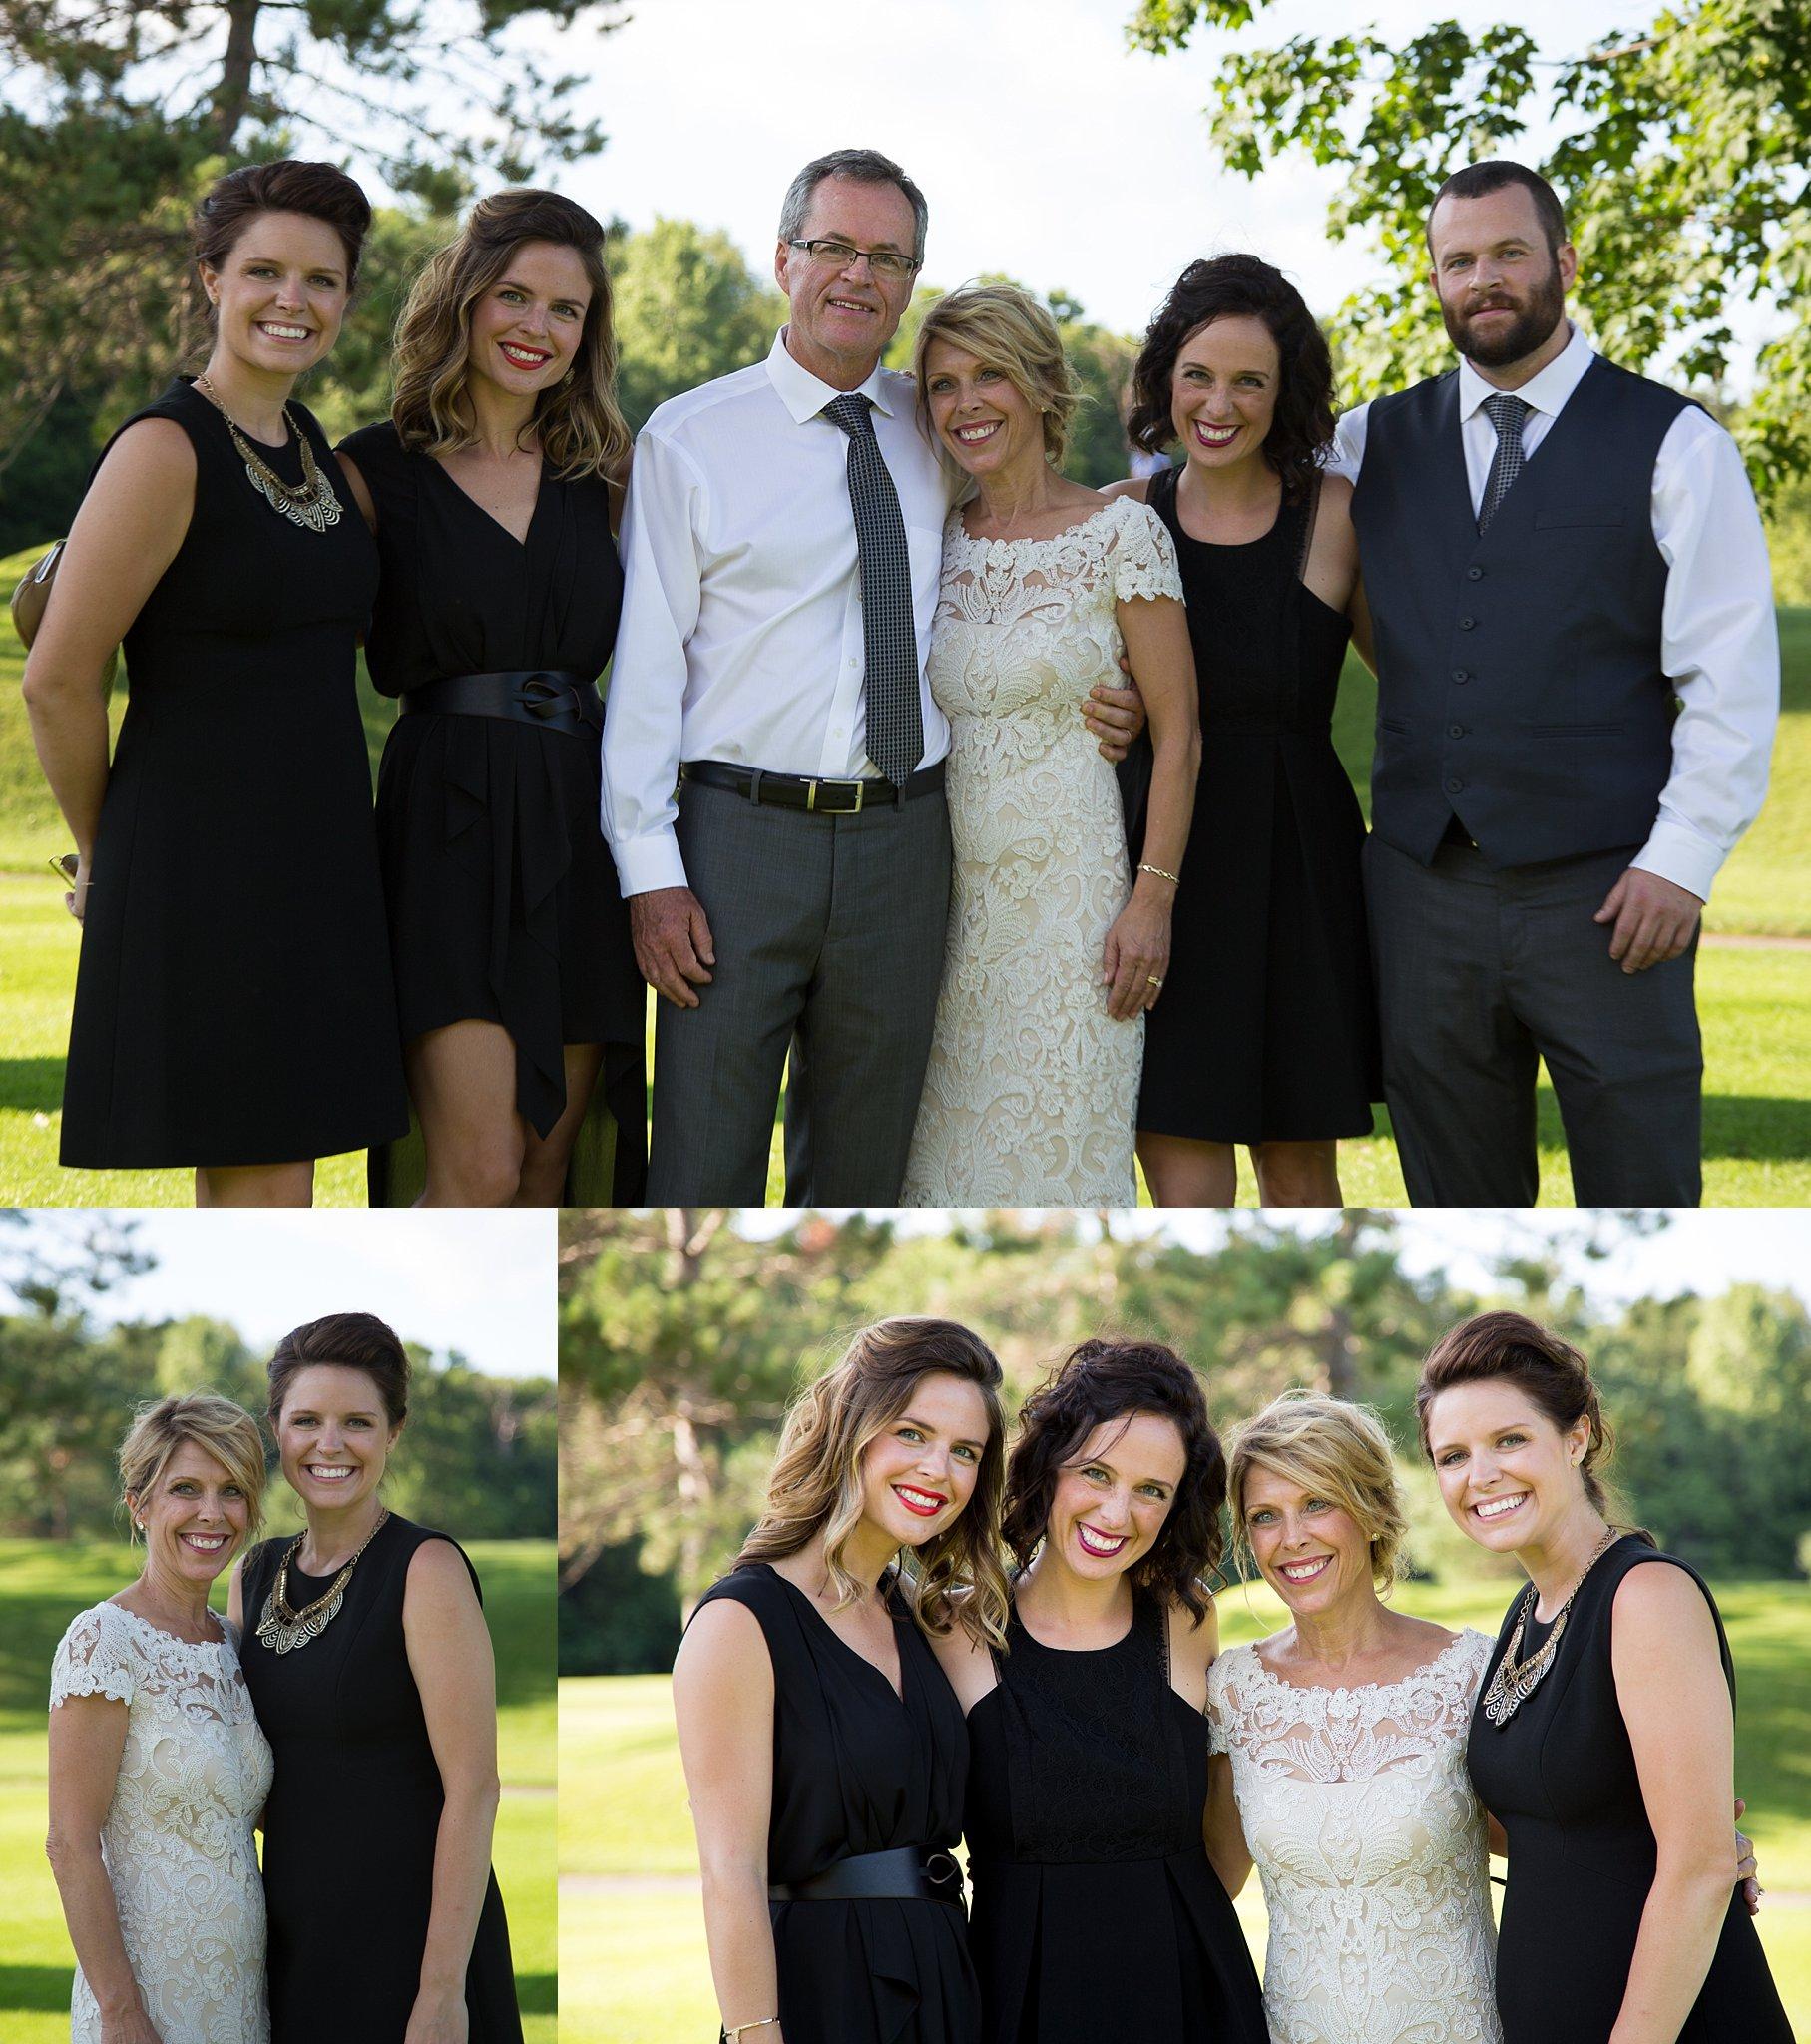 9Alice Hq Photography   Gary + Karen Le Sueur Country Club Wedding.jpg